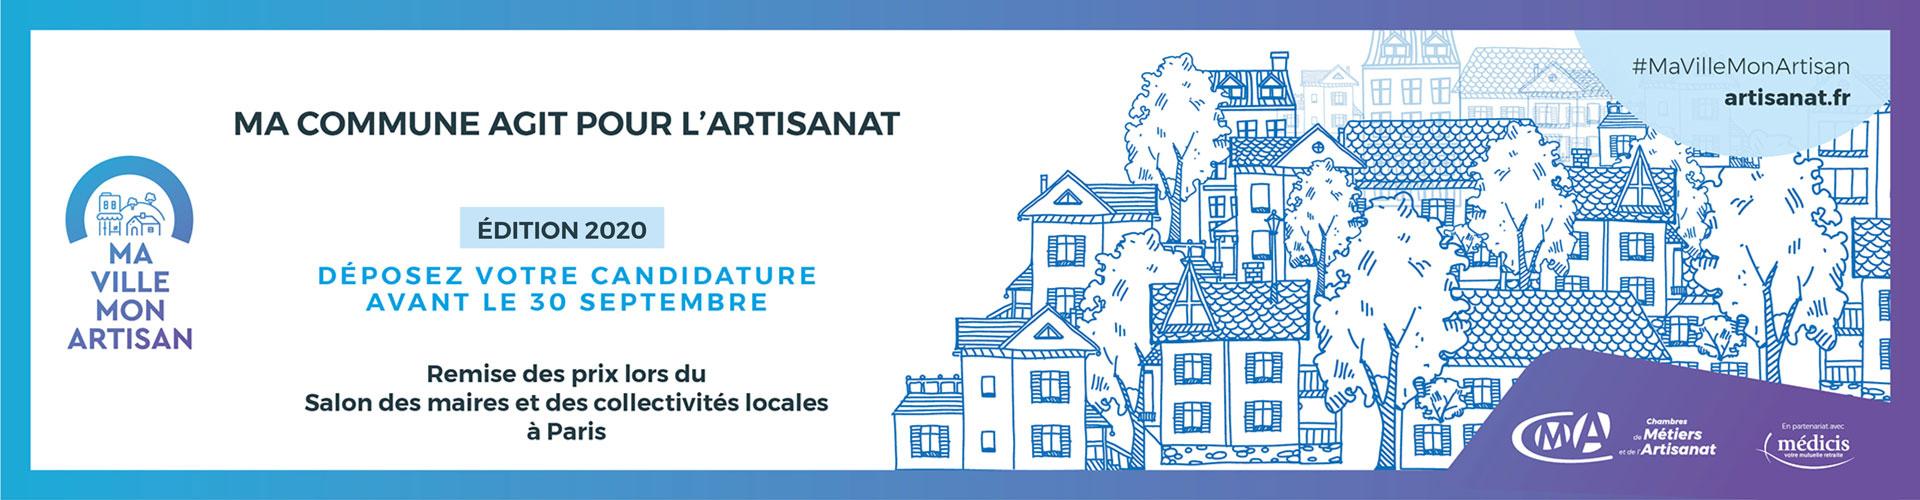 Chambre De Métiers Et De L'artisanat De L'ain   concernant Chambre Des Metiers Bobigny